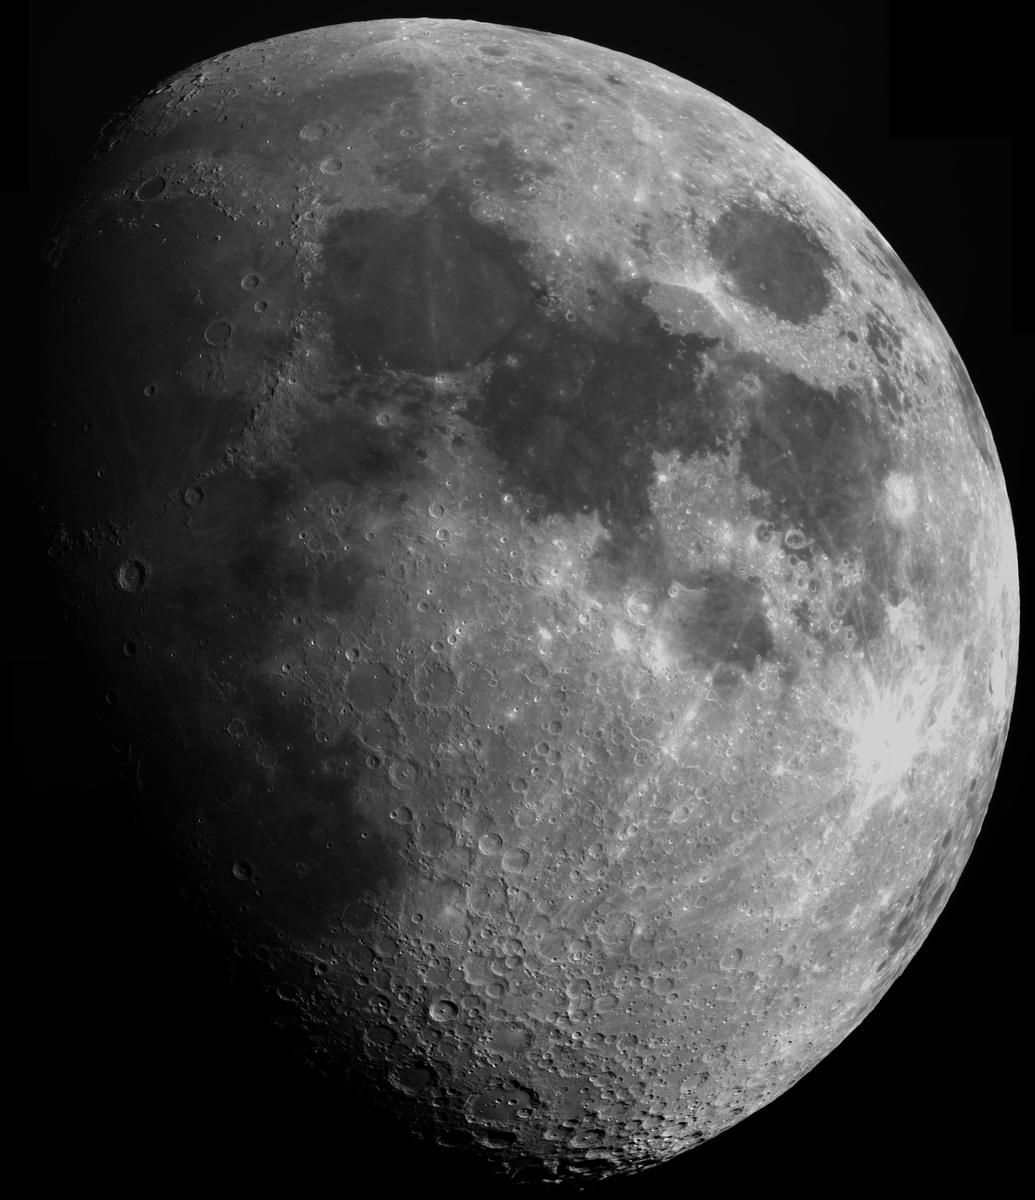 Moon_232233_g4_ap1136_conv_stitch_1.thumb.jpg.d141b17692f9cf941ad173bb85a44de5.jpg